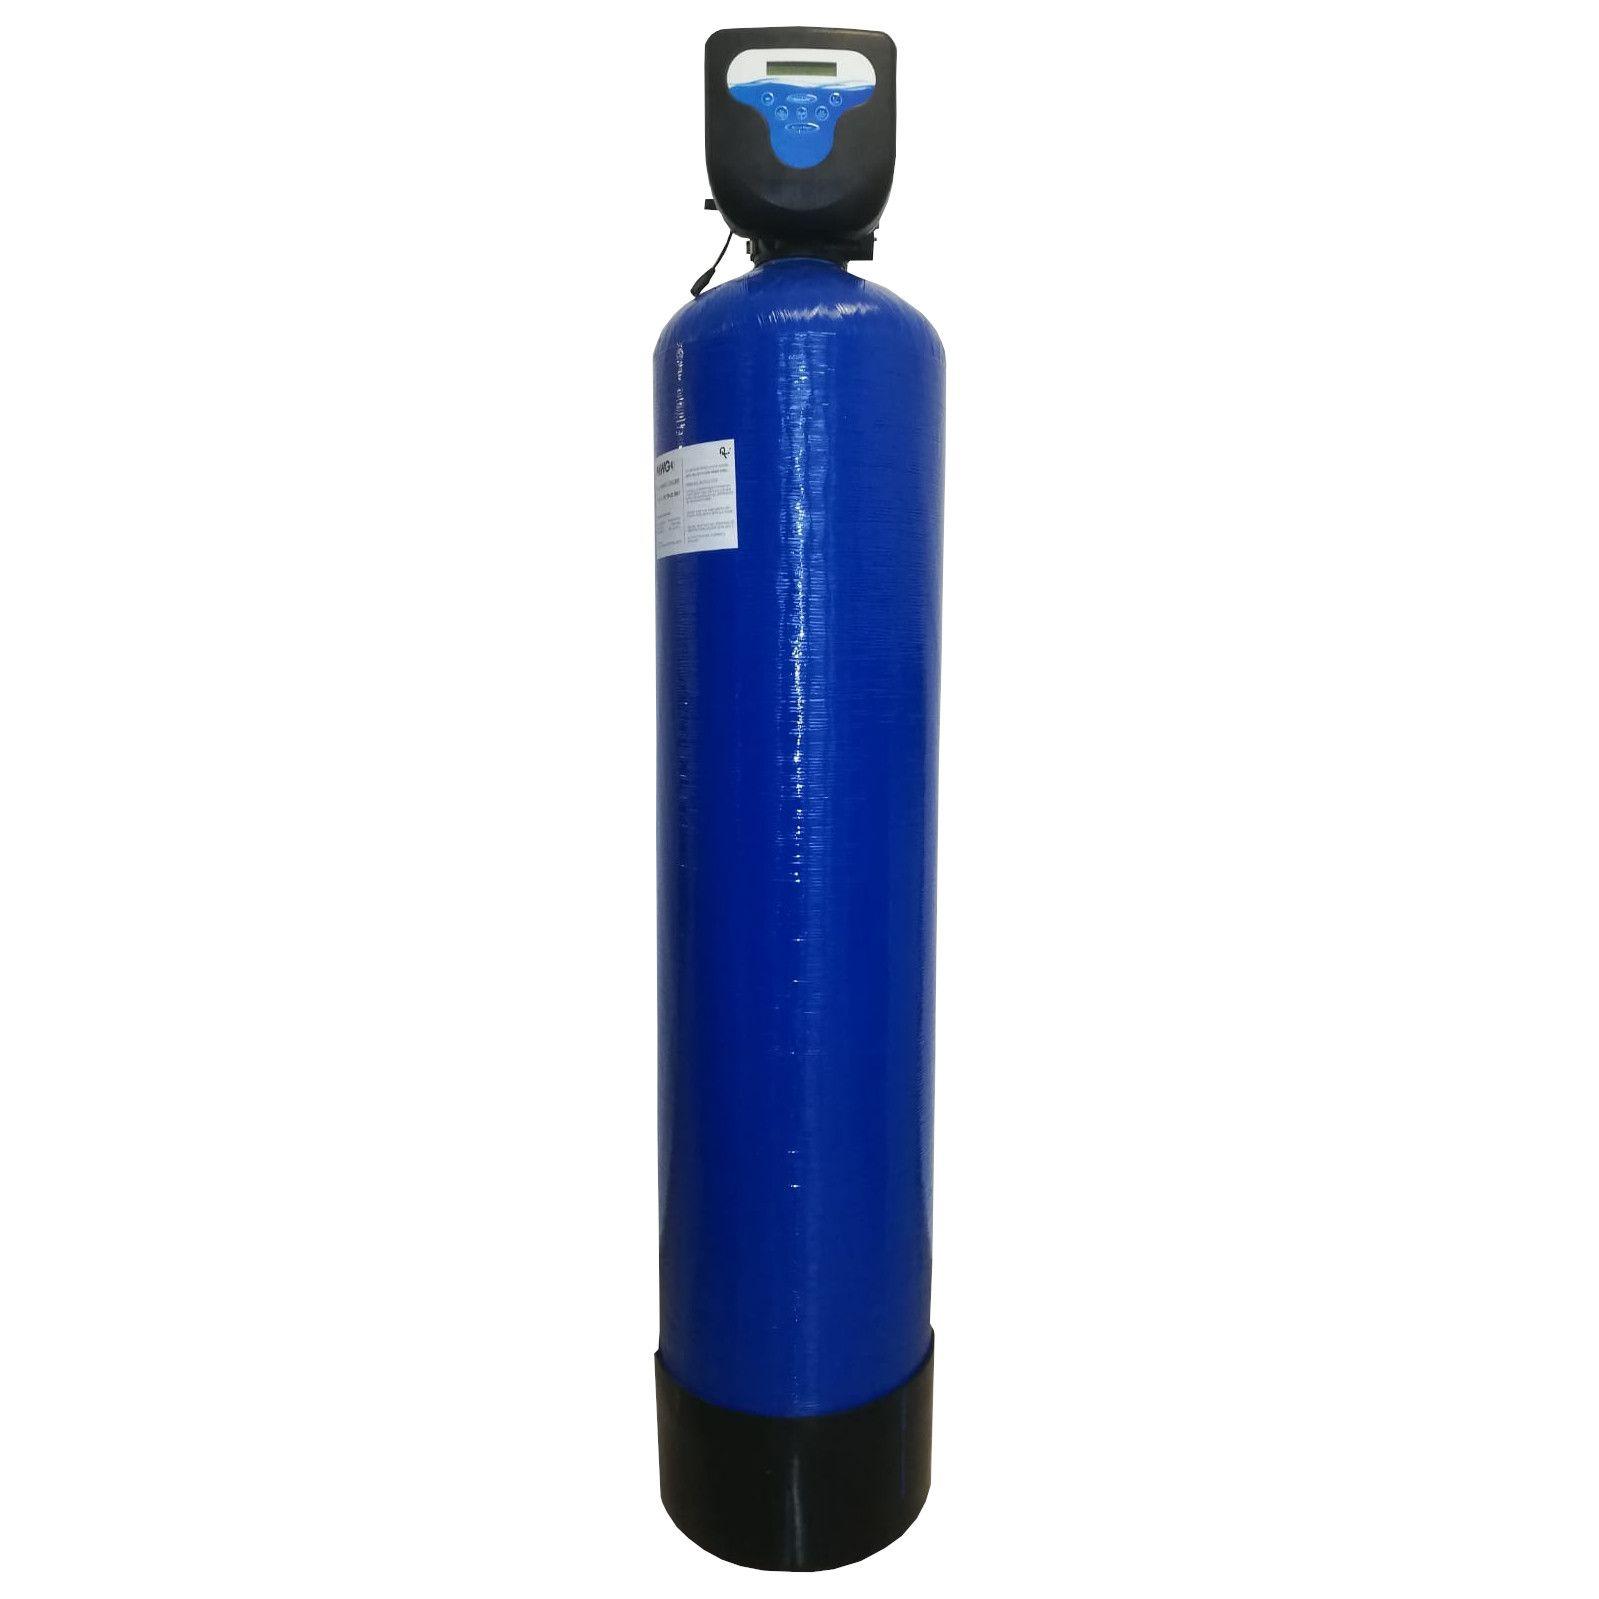 Filtru apa automat cu zeolit Aqua DM 55, Debit 3.7 mc/h, Capacitate filtrare 90.000 litri, Cartus din Rasina  - AquaFilters.ro